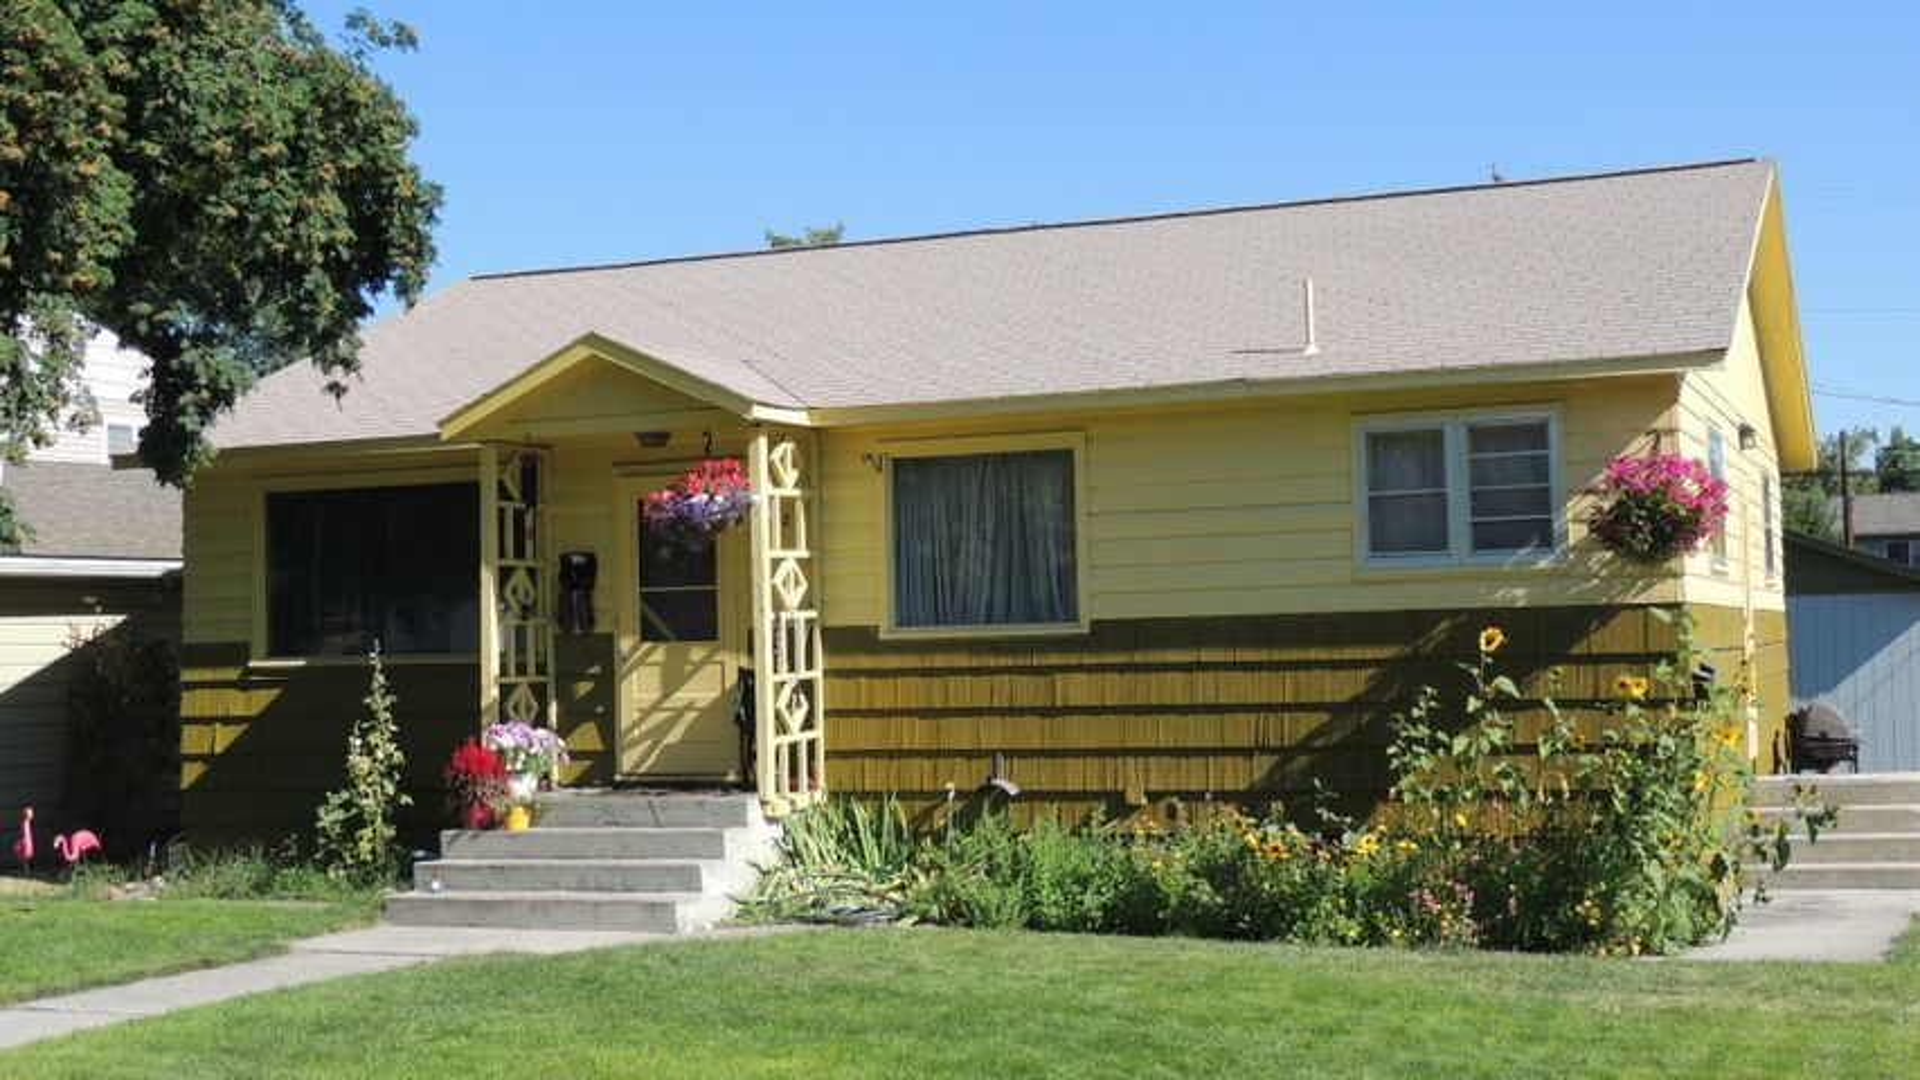 1530 11th Street West, Missoula, MT 59801